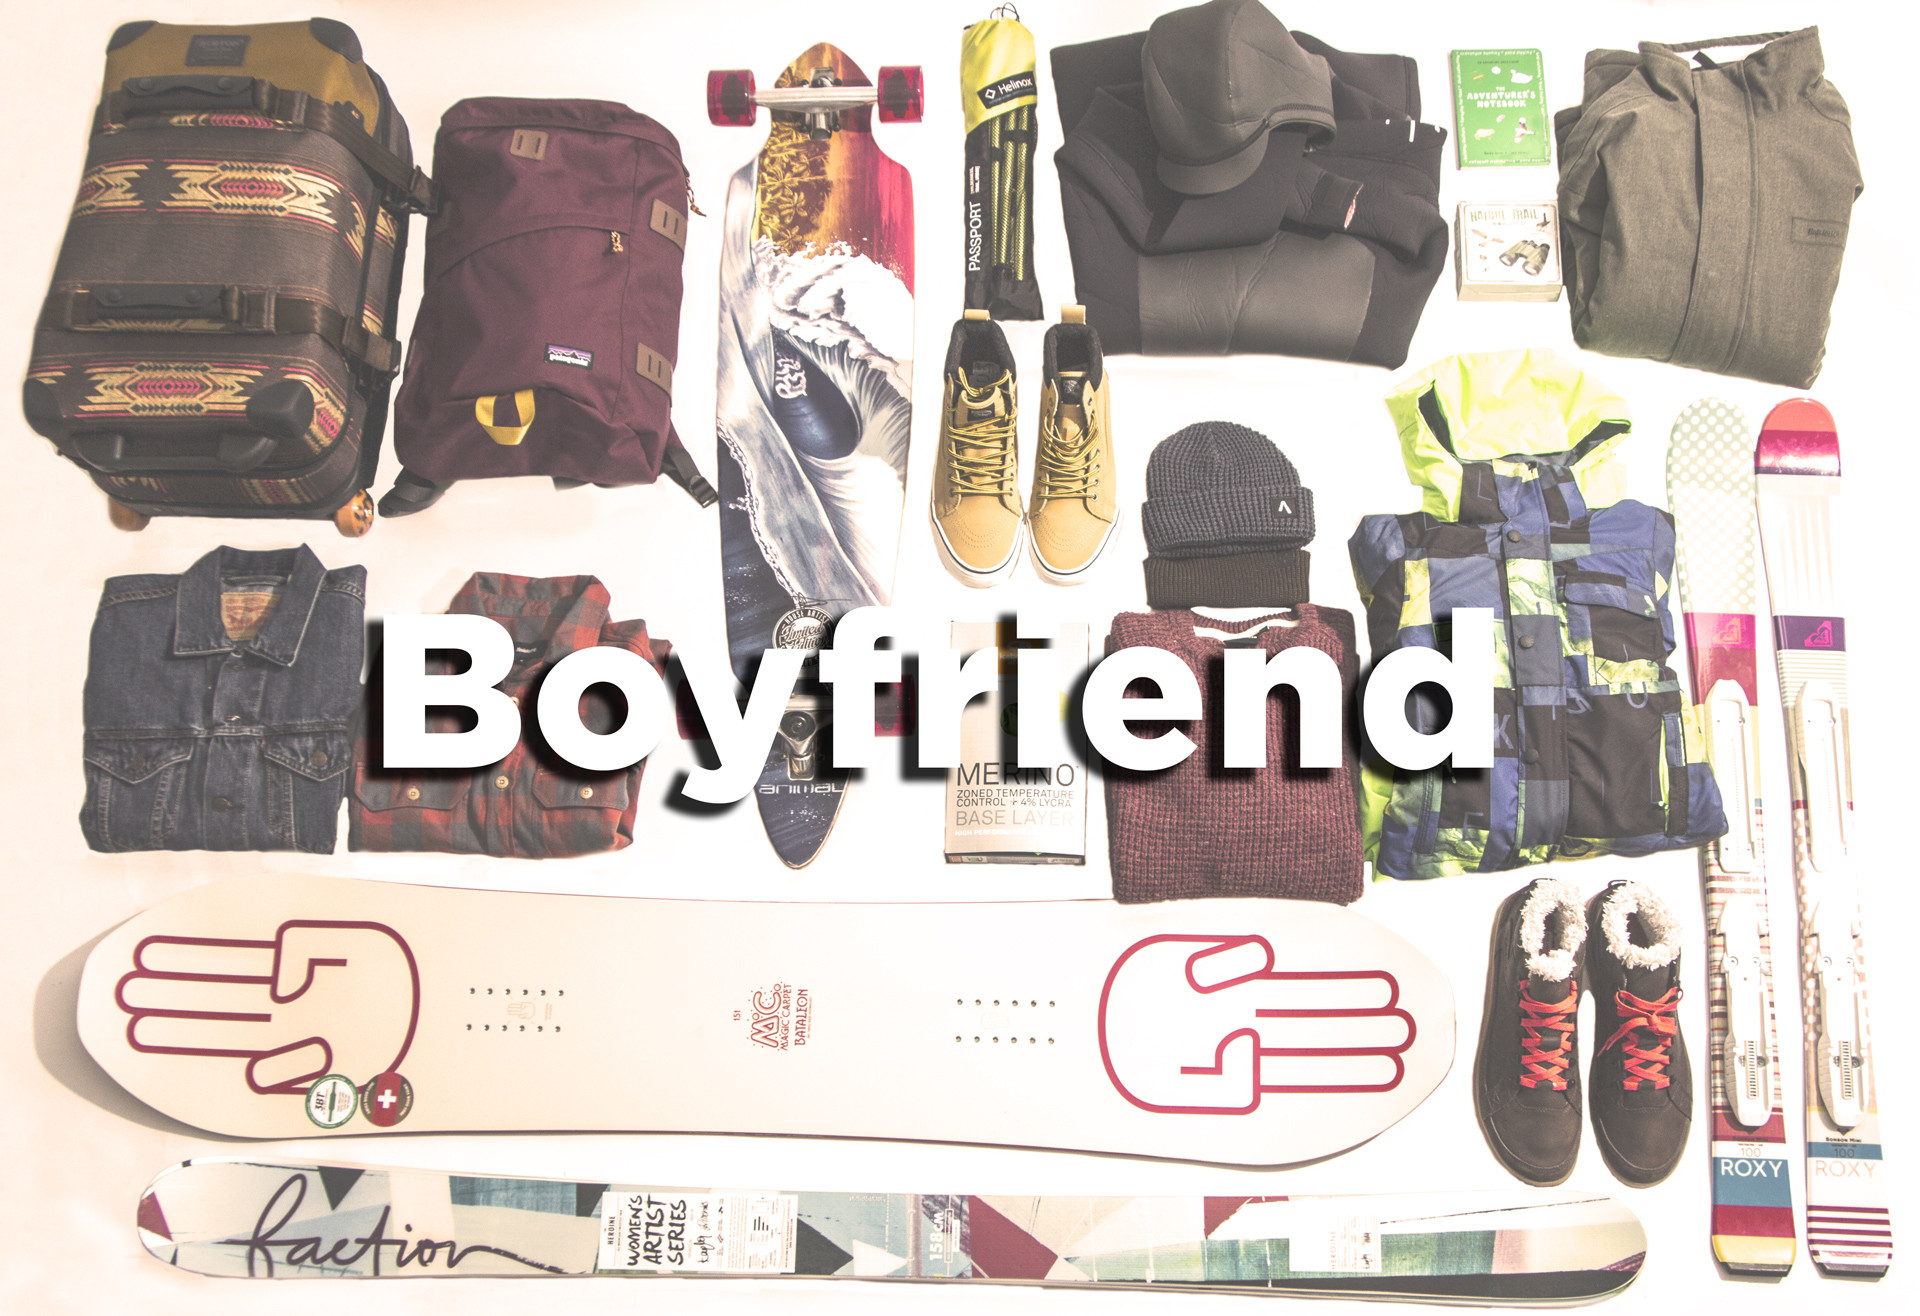 Gift Ideas For Boyfriend For Christmas  Christmas Gift Ideas For A Boyfriend 15 Great Gifts